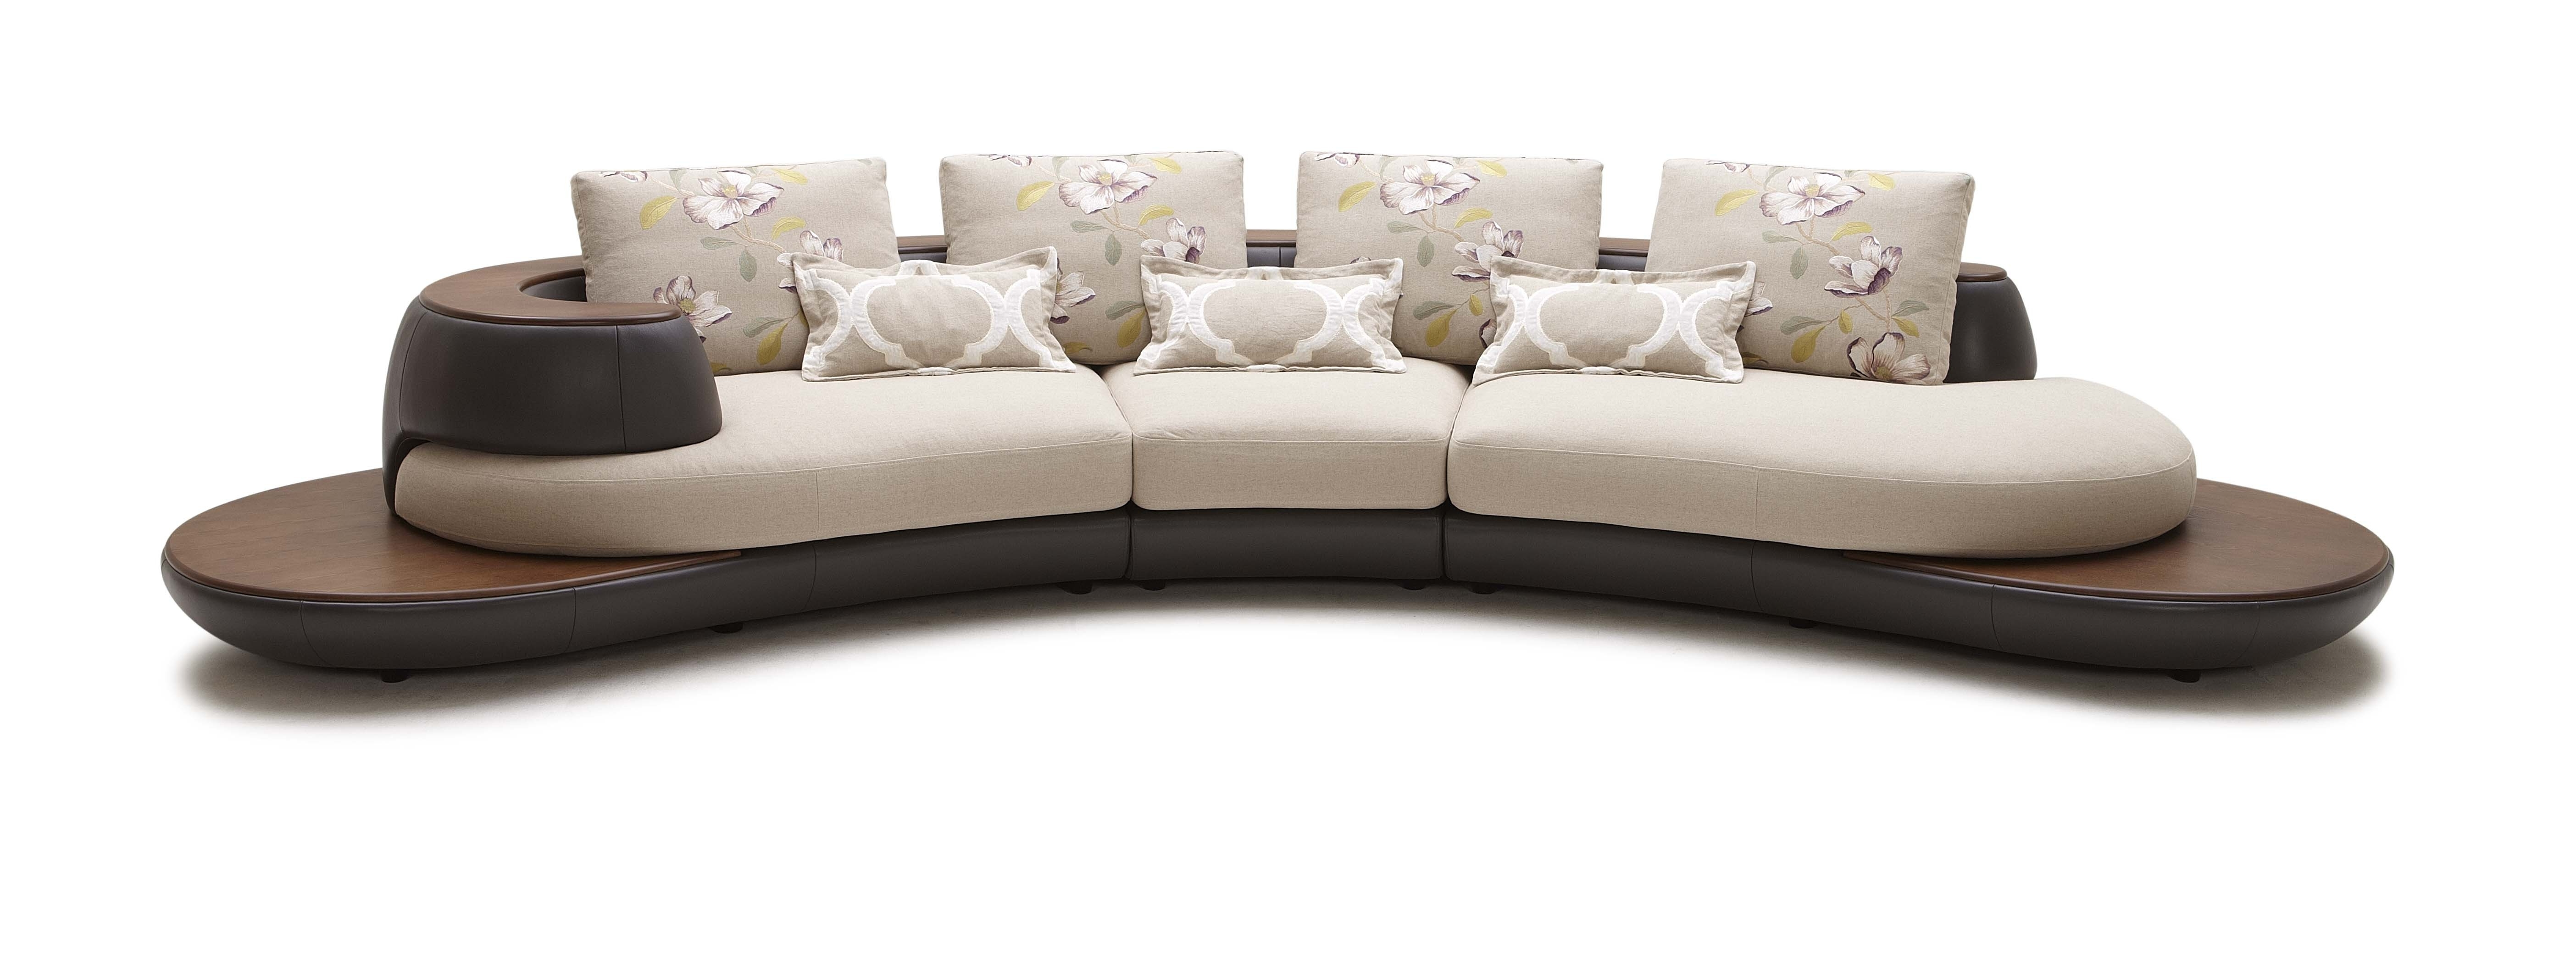 Unusual Sofas Regarding 2018 Modern Unusual Sofa Design Superb Living Room Furniture Best Type (View 12 of 15)